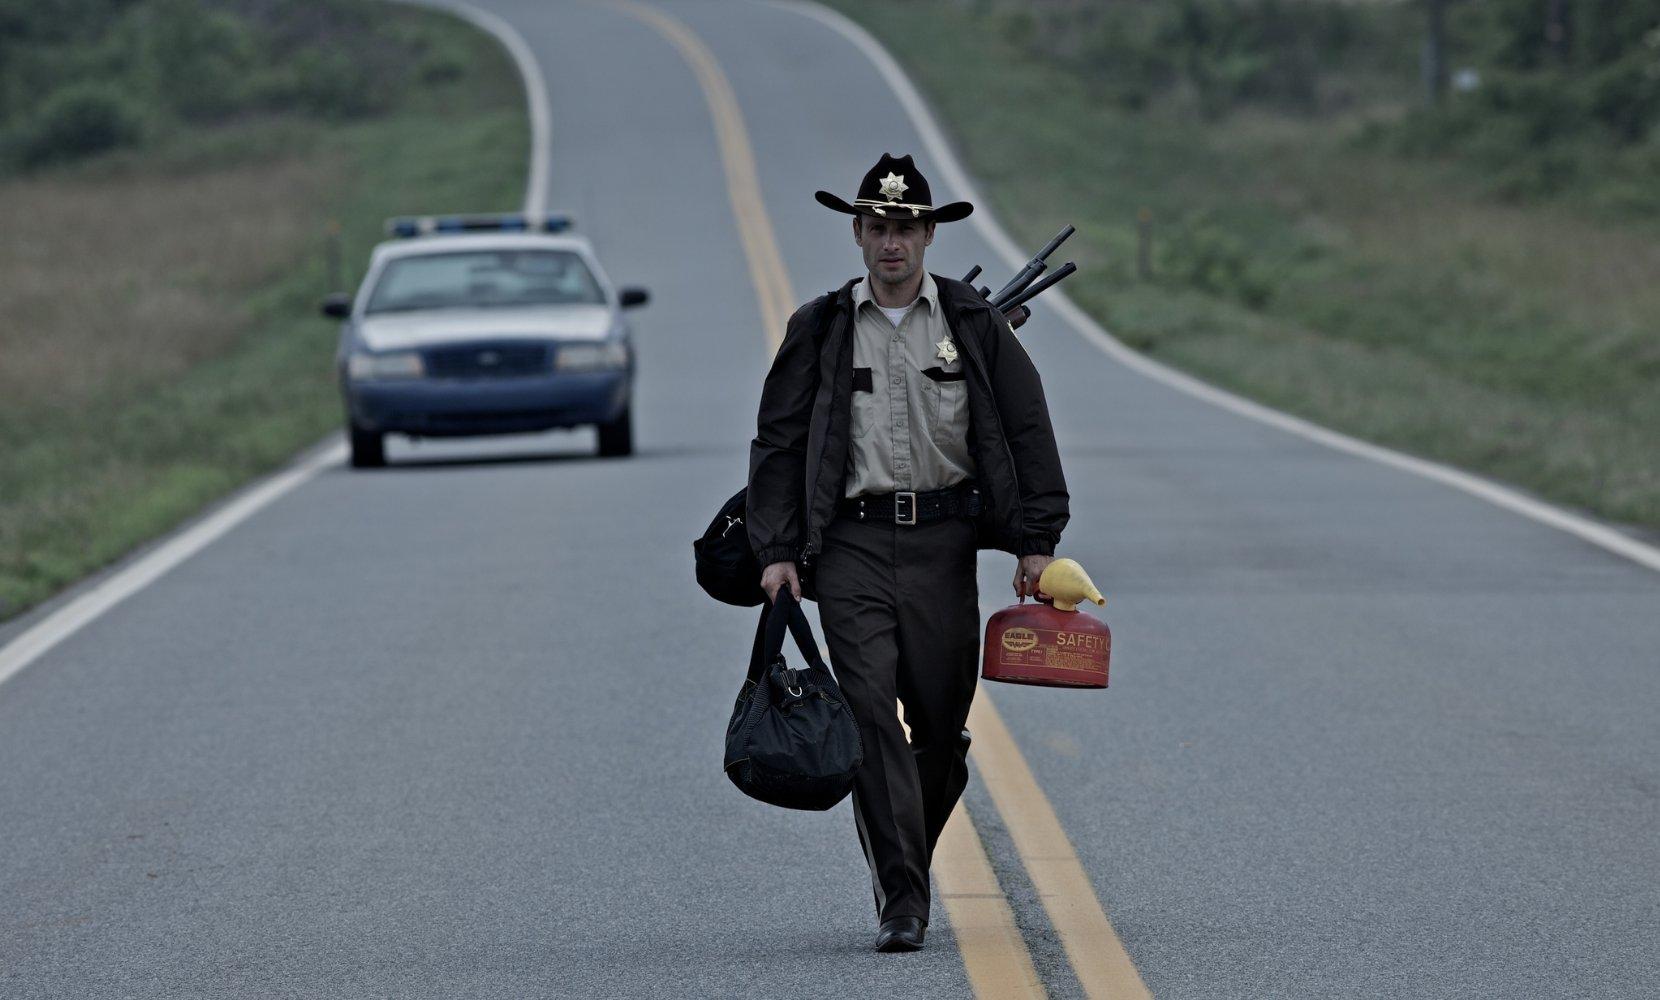 Sheriff Rick Grimes